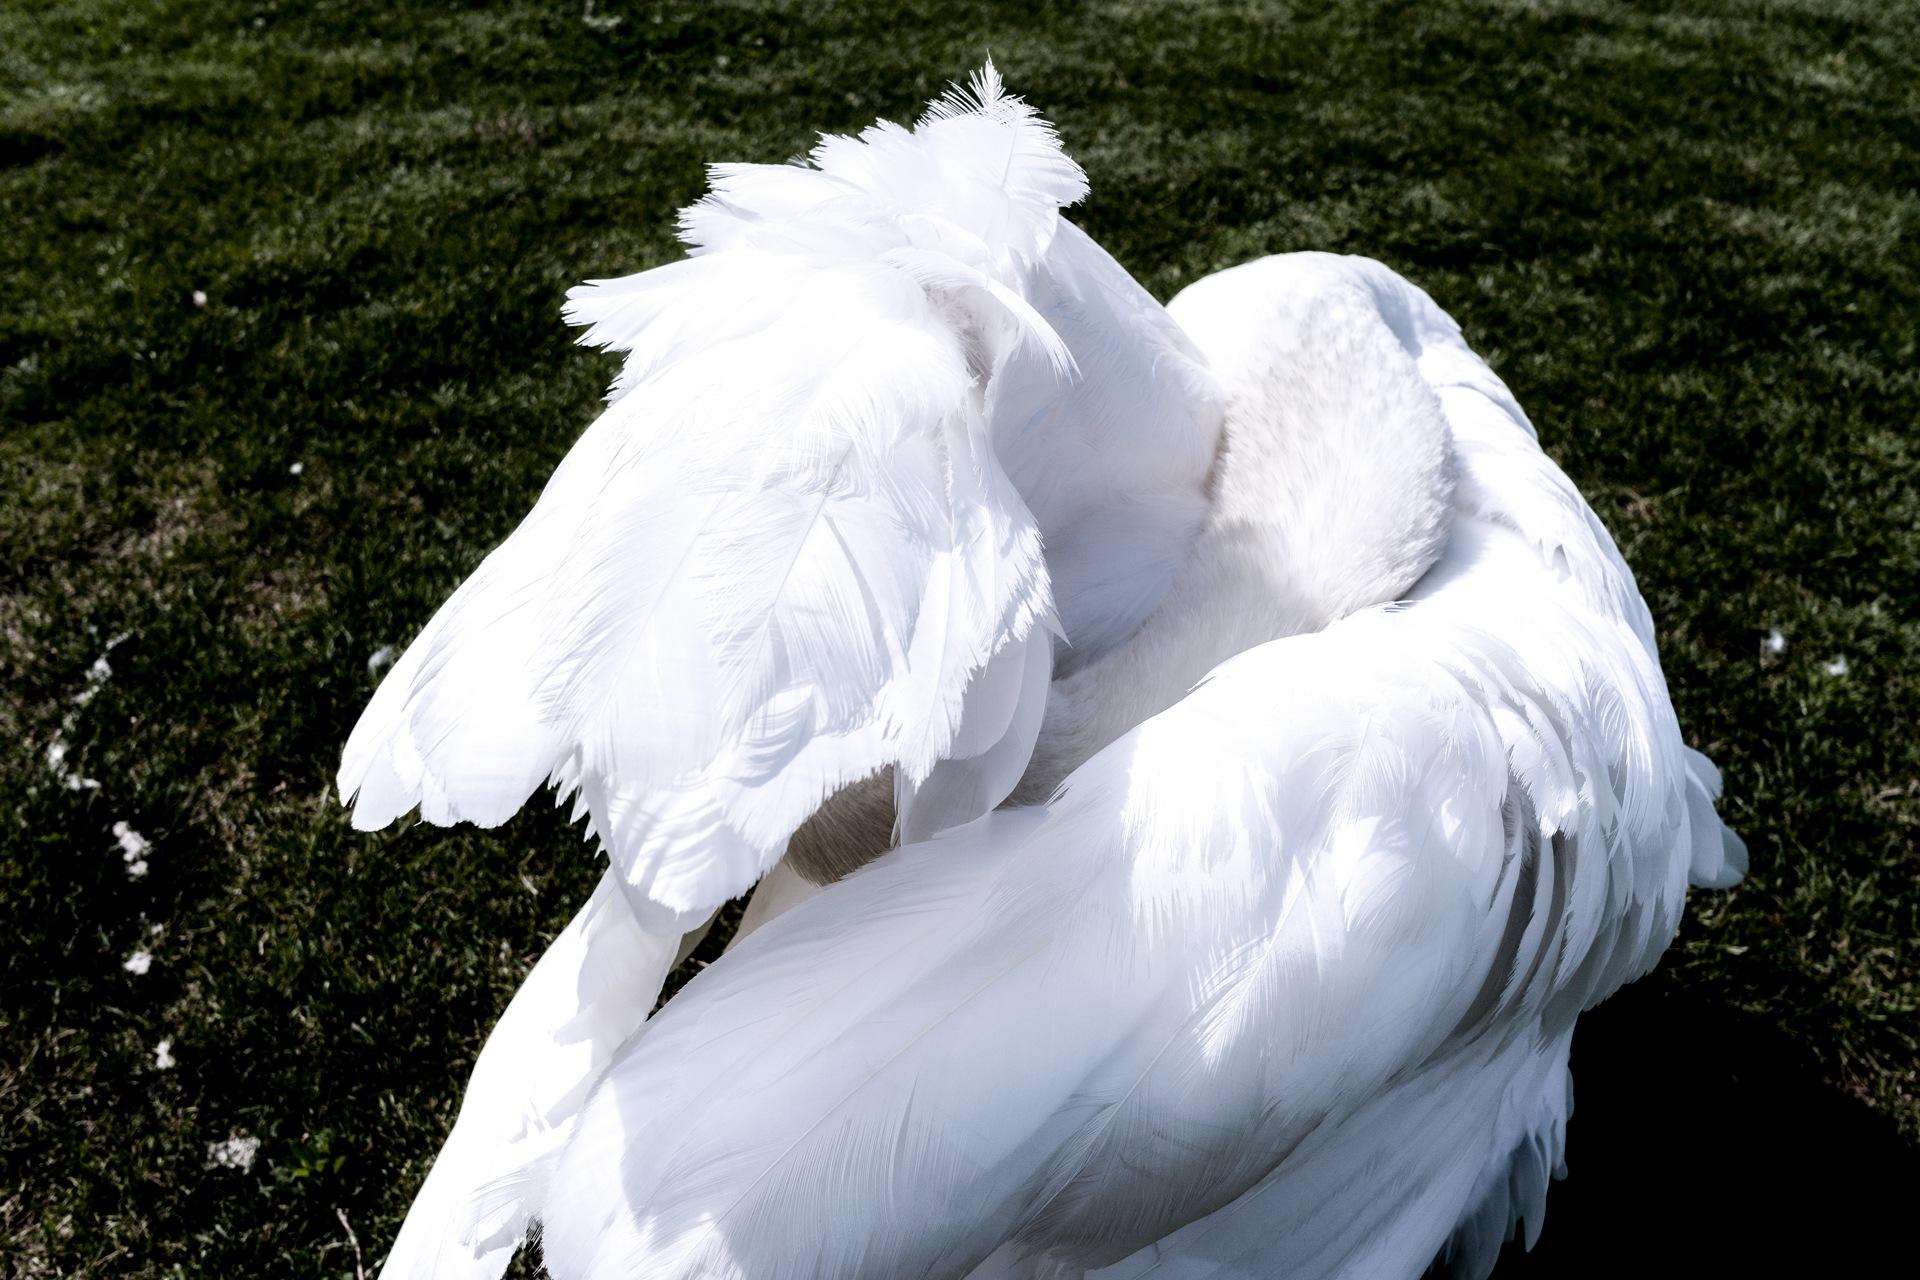 My beautiful and bashful swan by Venelin Todorov